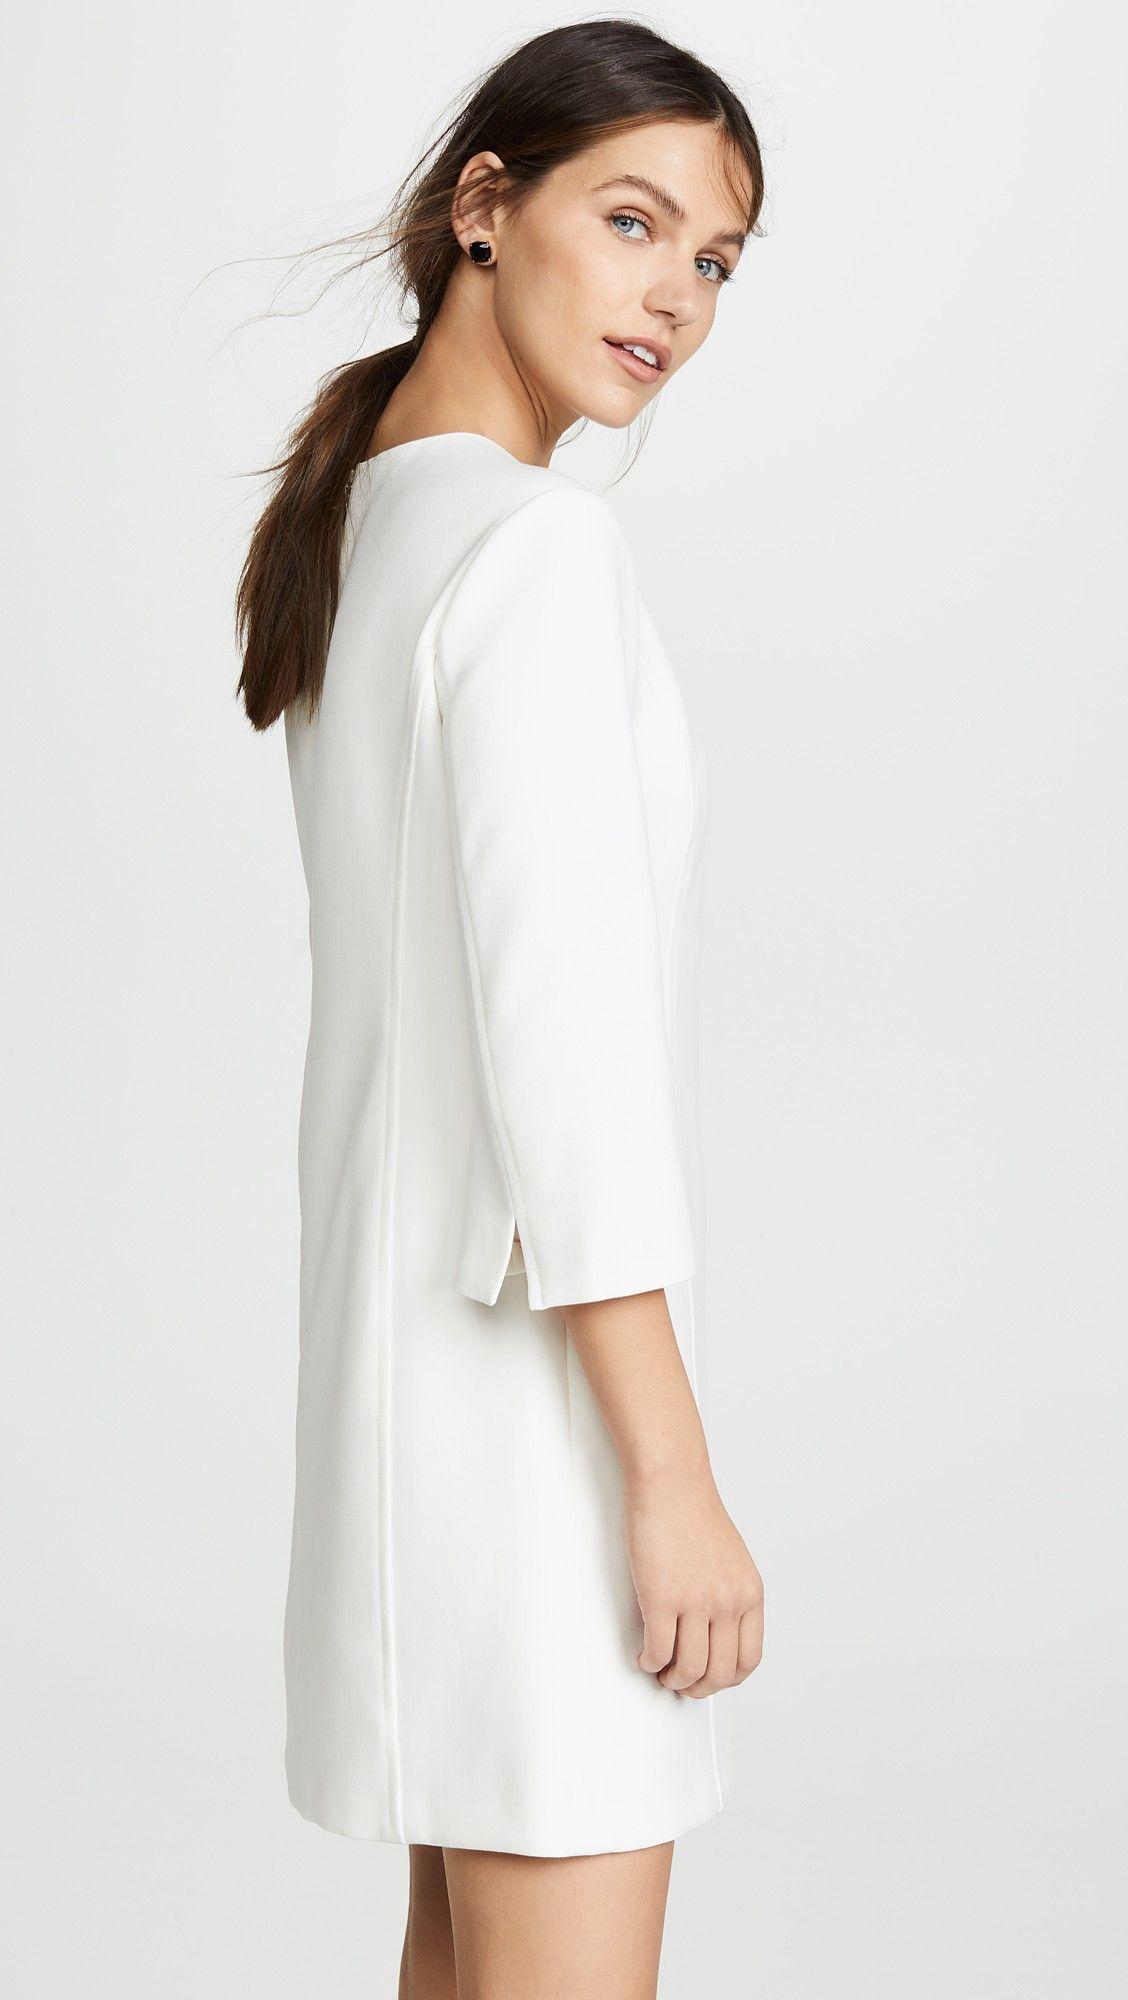 Alice Olivia Gem 3 4 Sleeve Shift Dress In 2021 Shift Dress Dresses Day To Night Dresses [ 2000 x 1128 Pixel ]